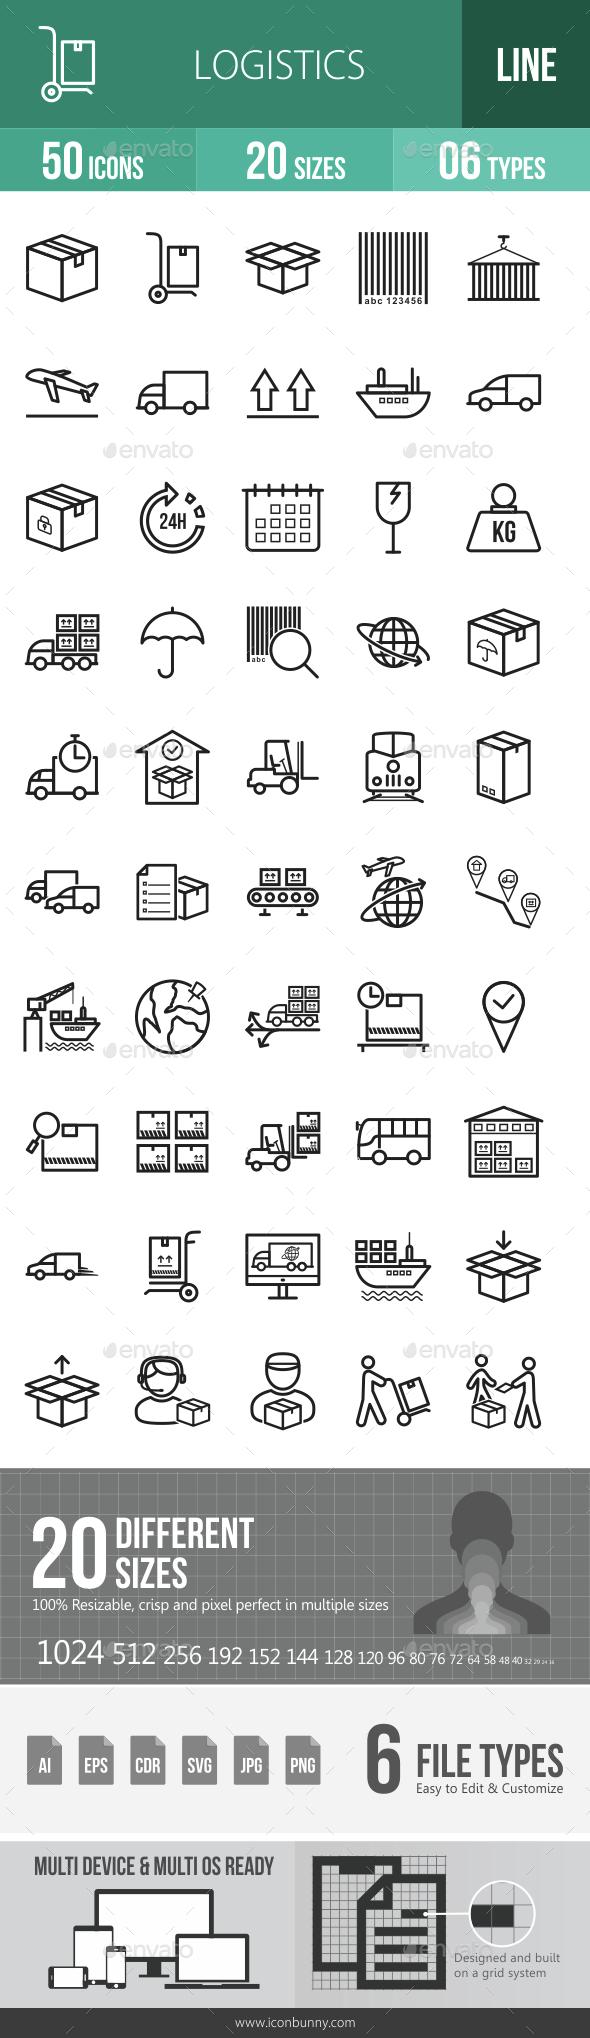 Logistics Line Icons - Icons